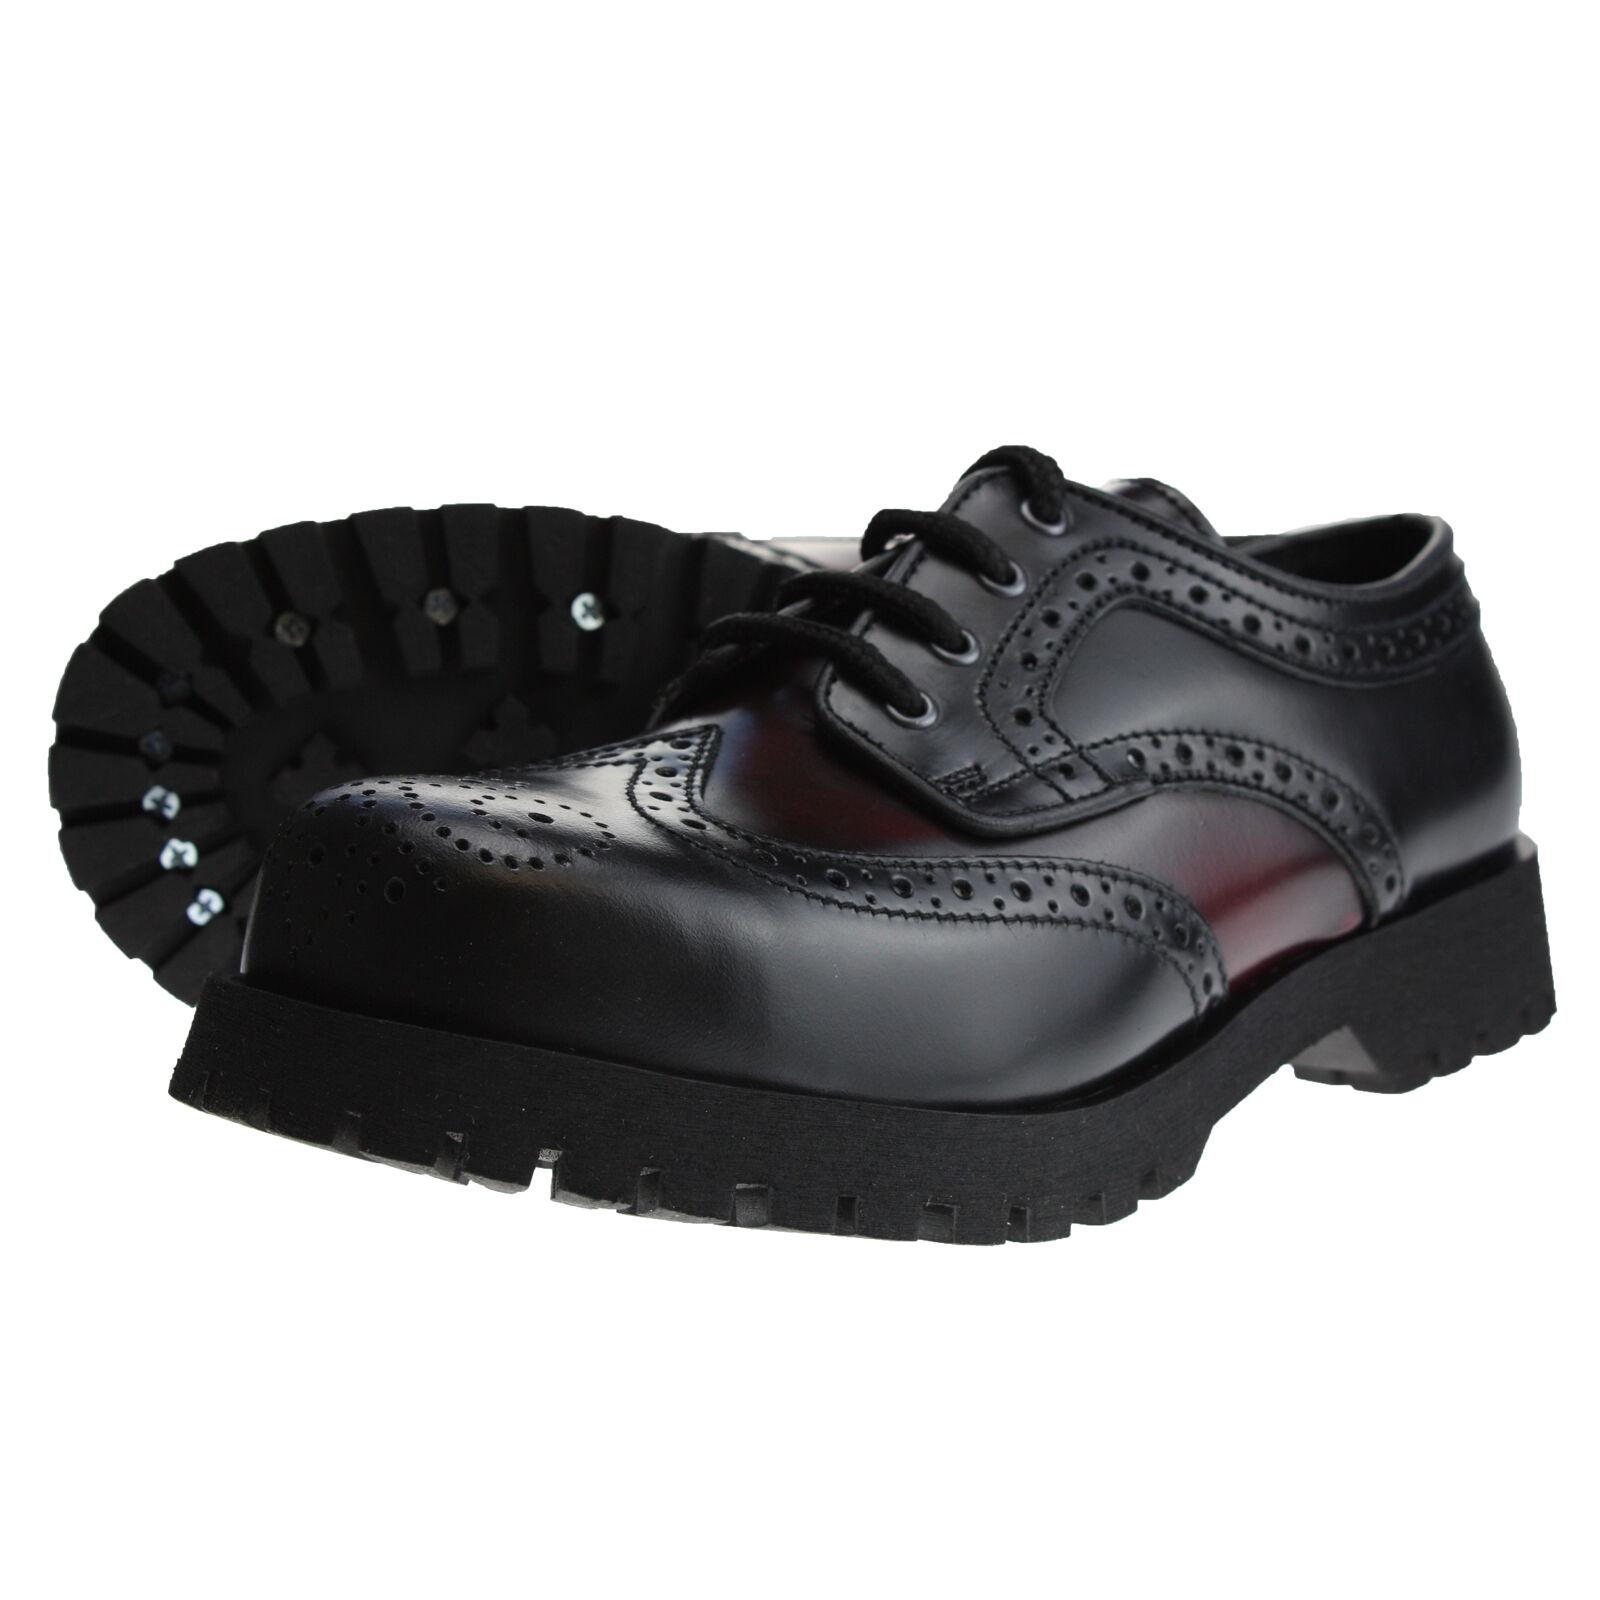 Stiefel and Braces Budapester Schwarz   Burgundy Leder Schuhe 4-Loch Stahlkappe     |  | Eleganter Stil  | Discount